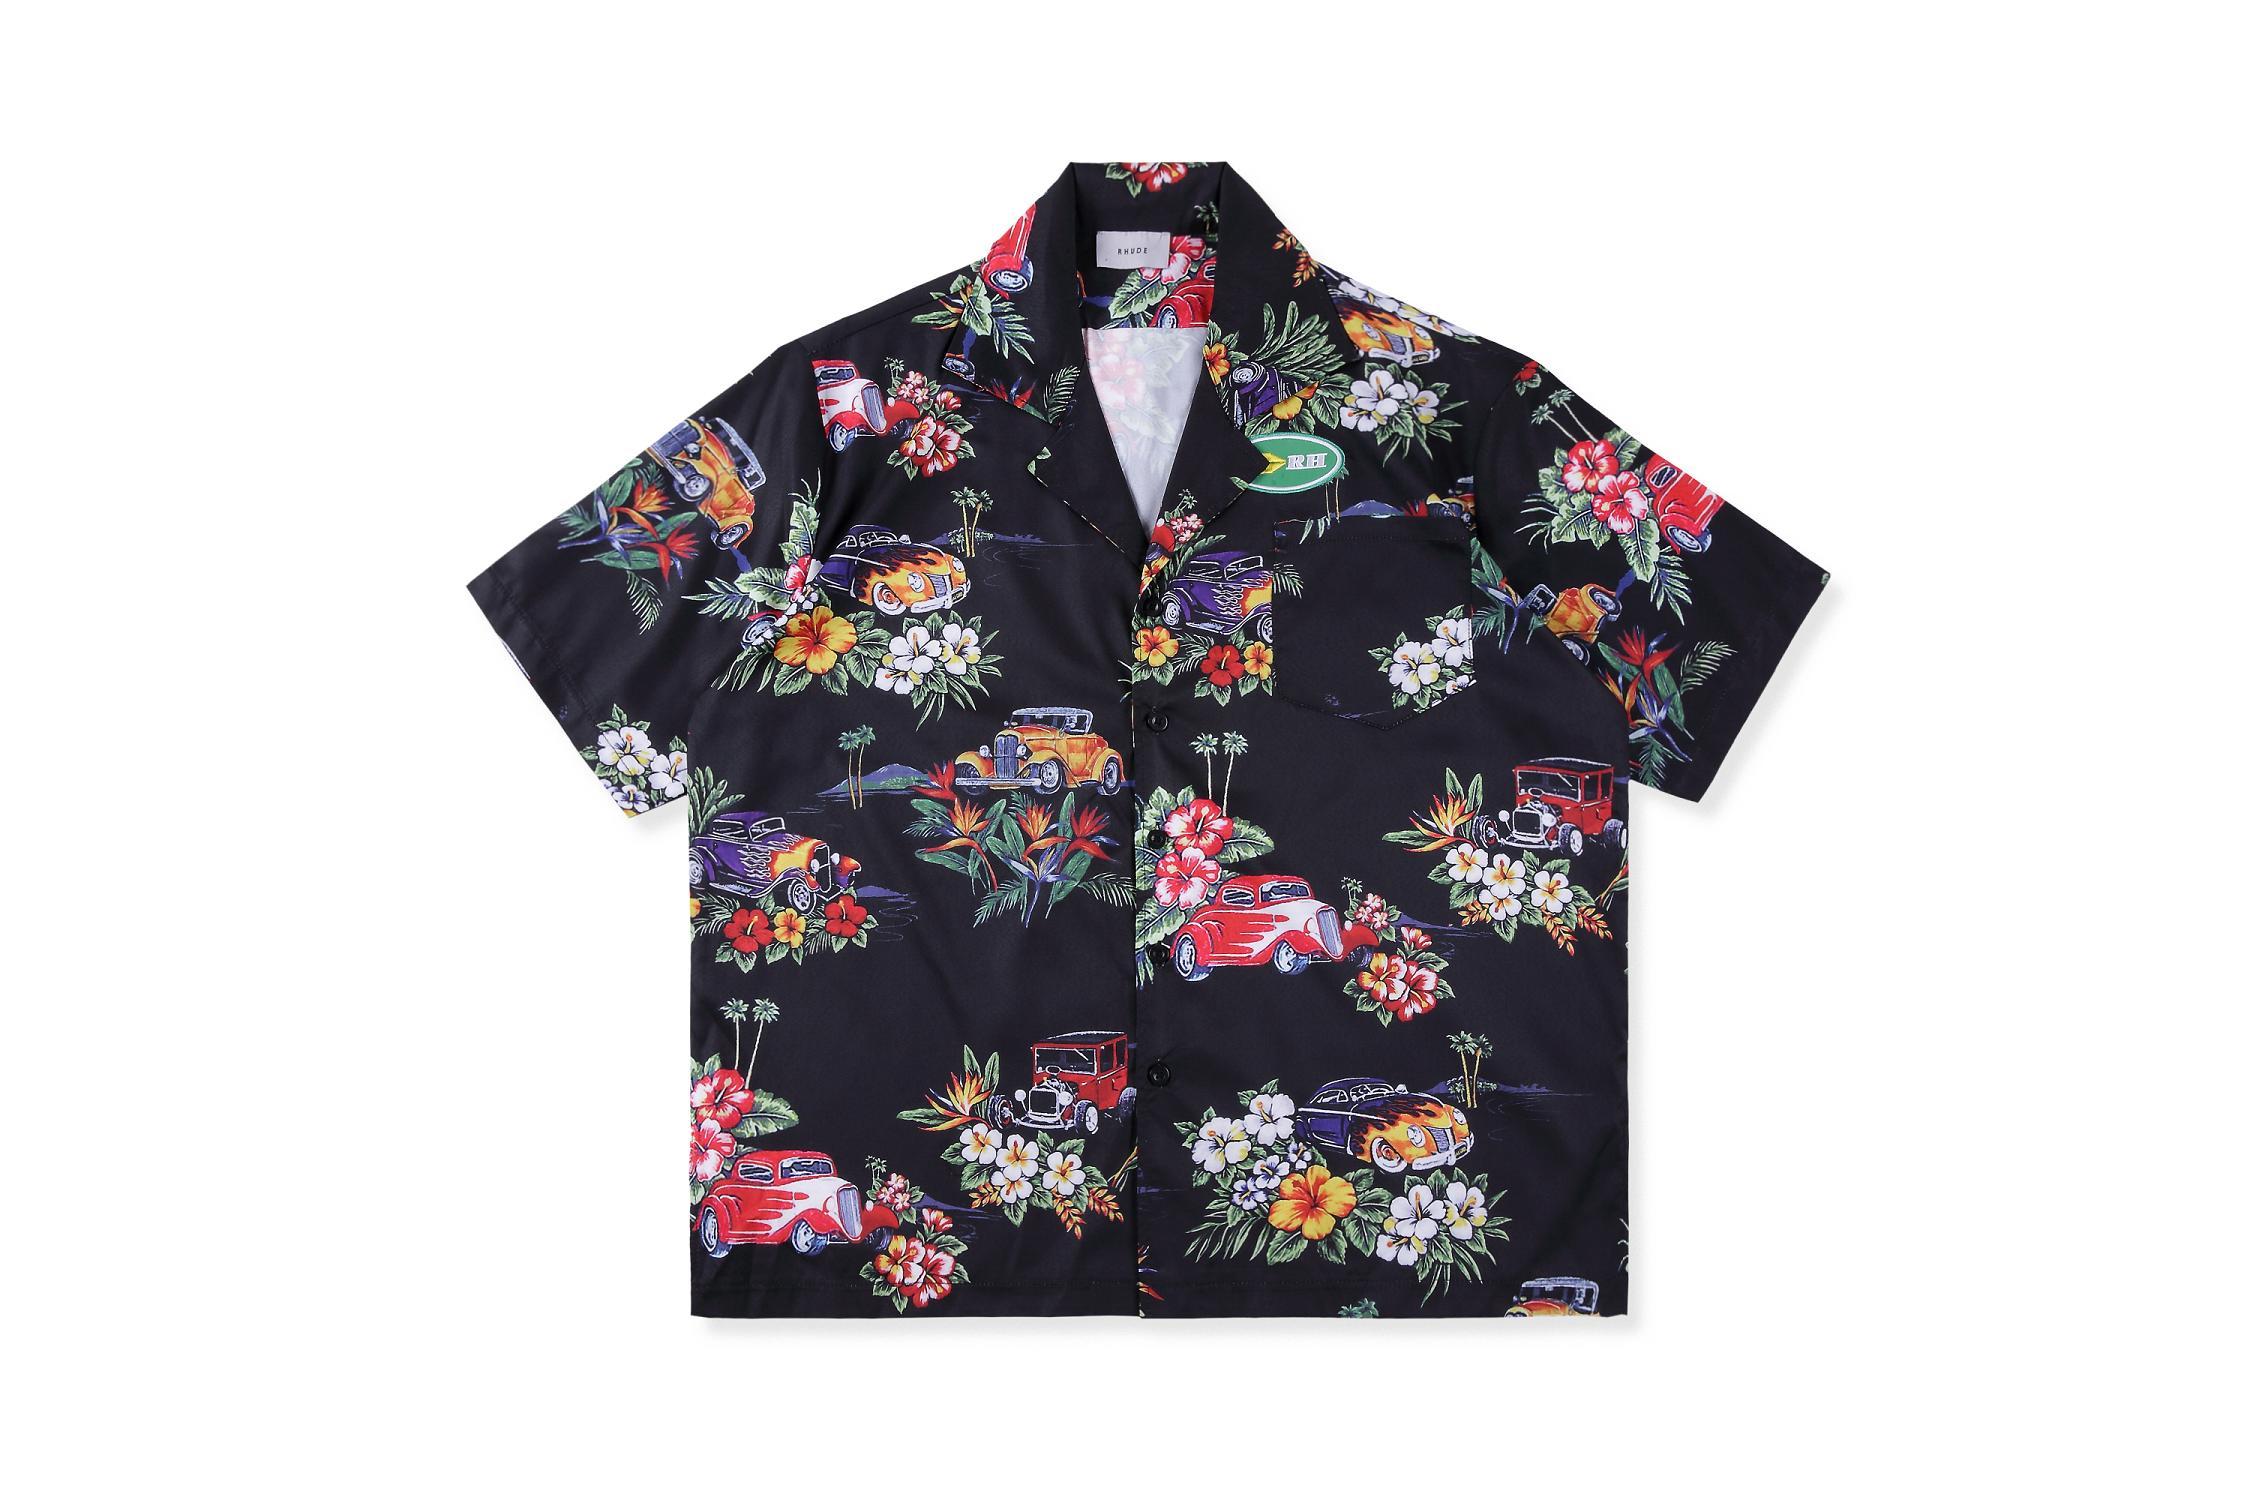 20ss rhude tshirt dos homens do havaí 11 versão superior curto camiseta rhude topo t streetwear hip hop casual rhude tshirt